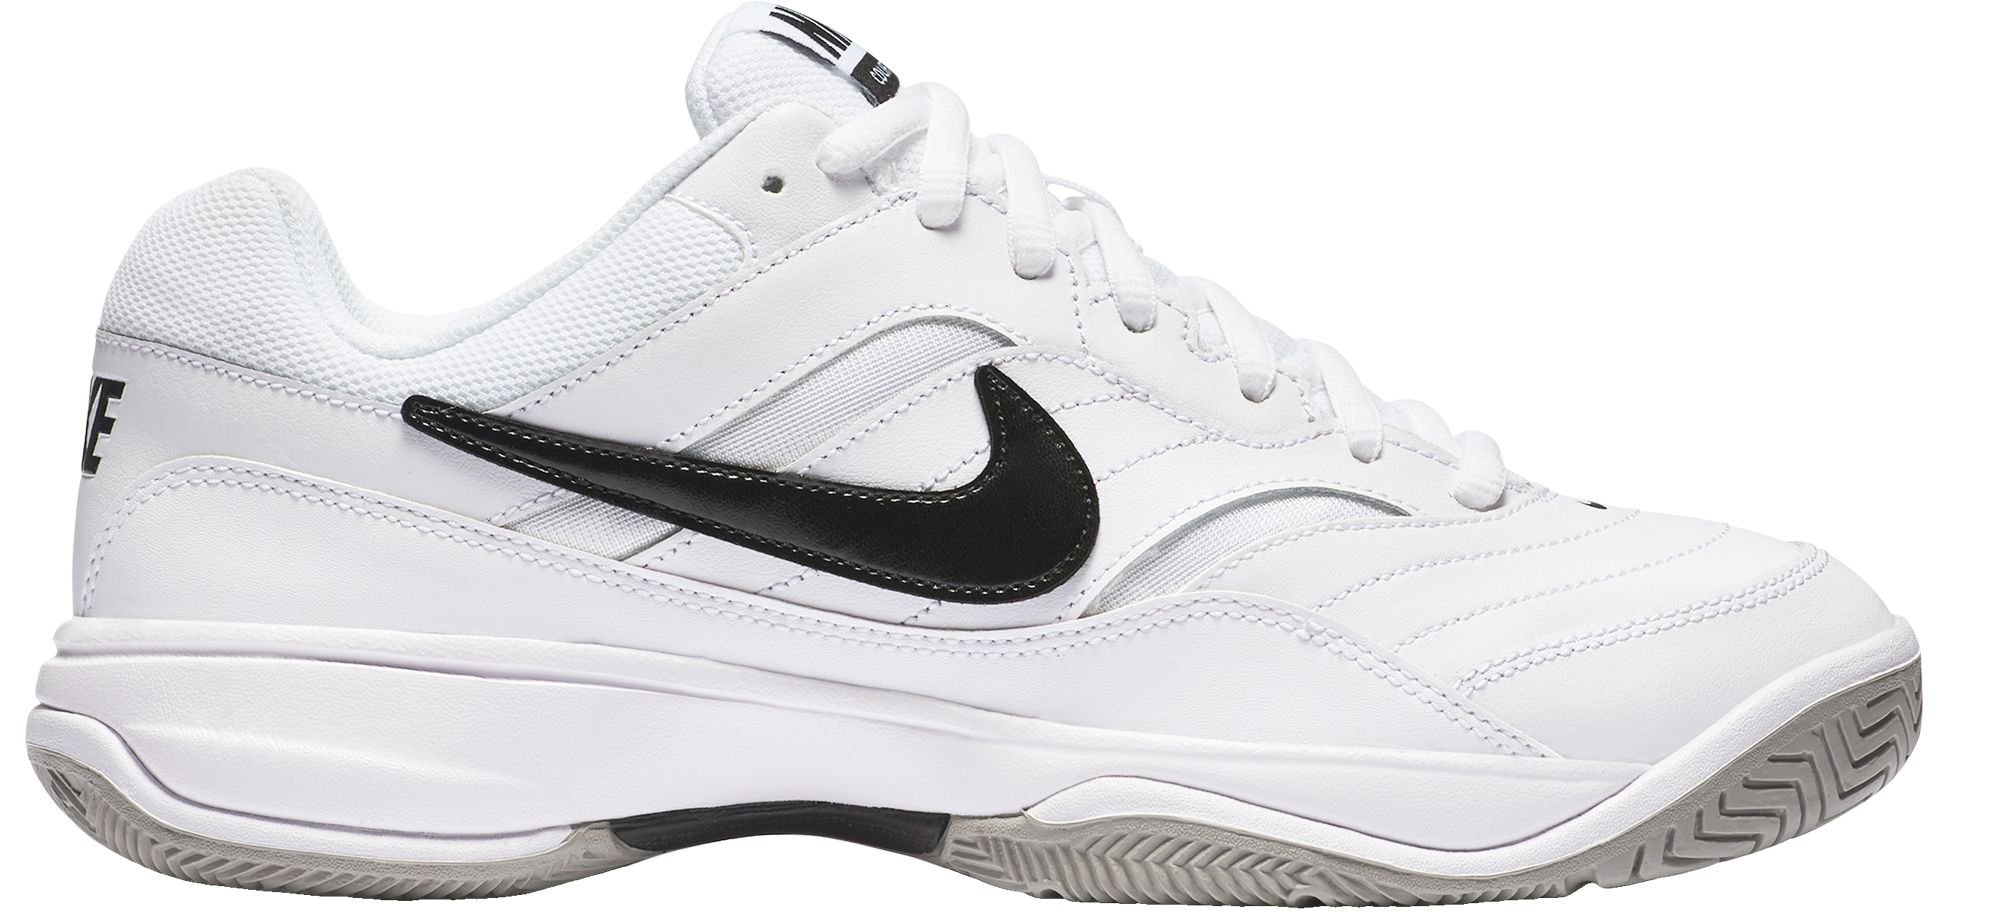 NIKE Men's Court Lite Tennis Shoe, White/Medium Grey/Black, 8.5 D(M) US